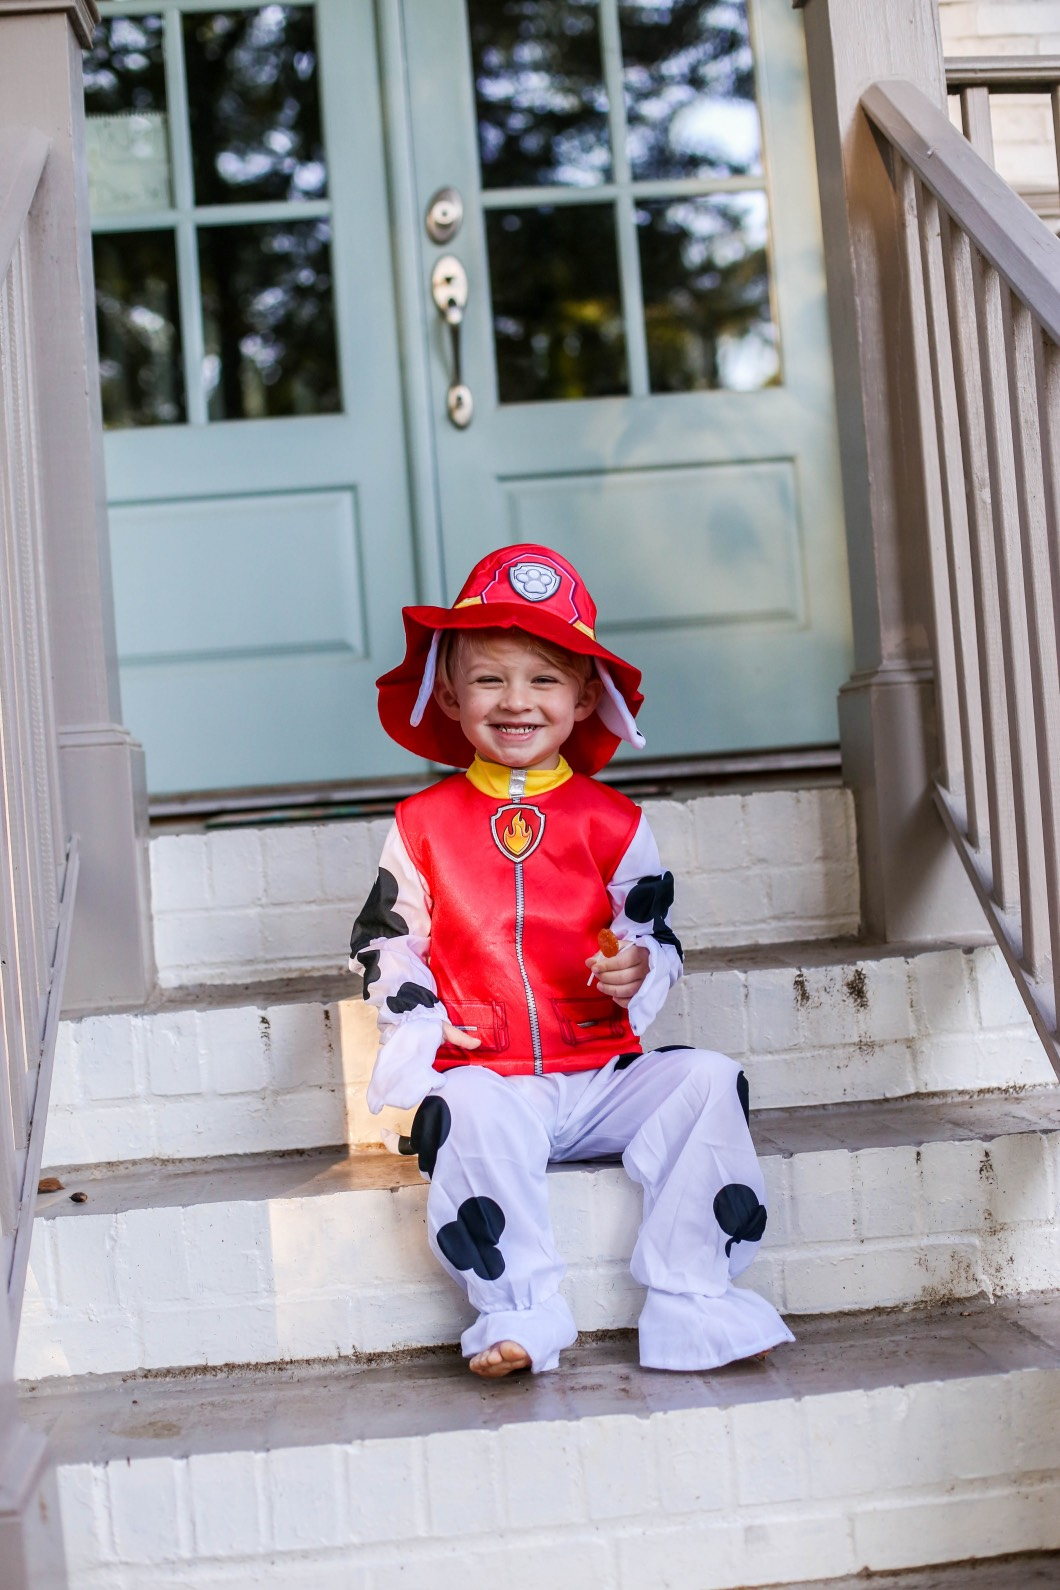 Party City Paw Patrol Fireman Toddler